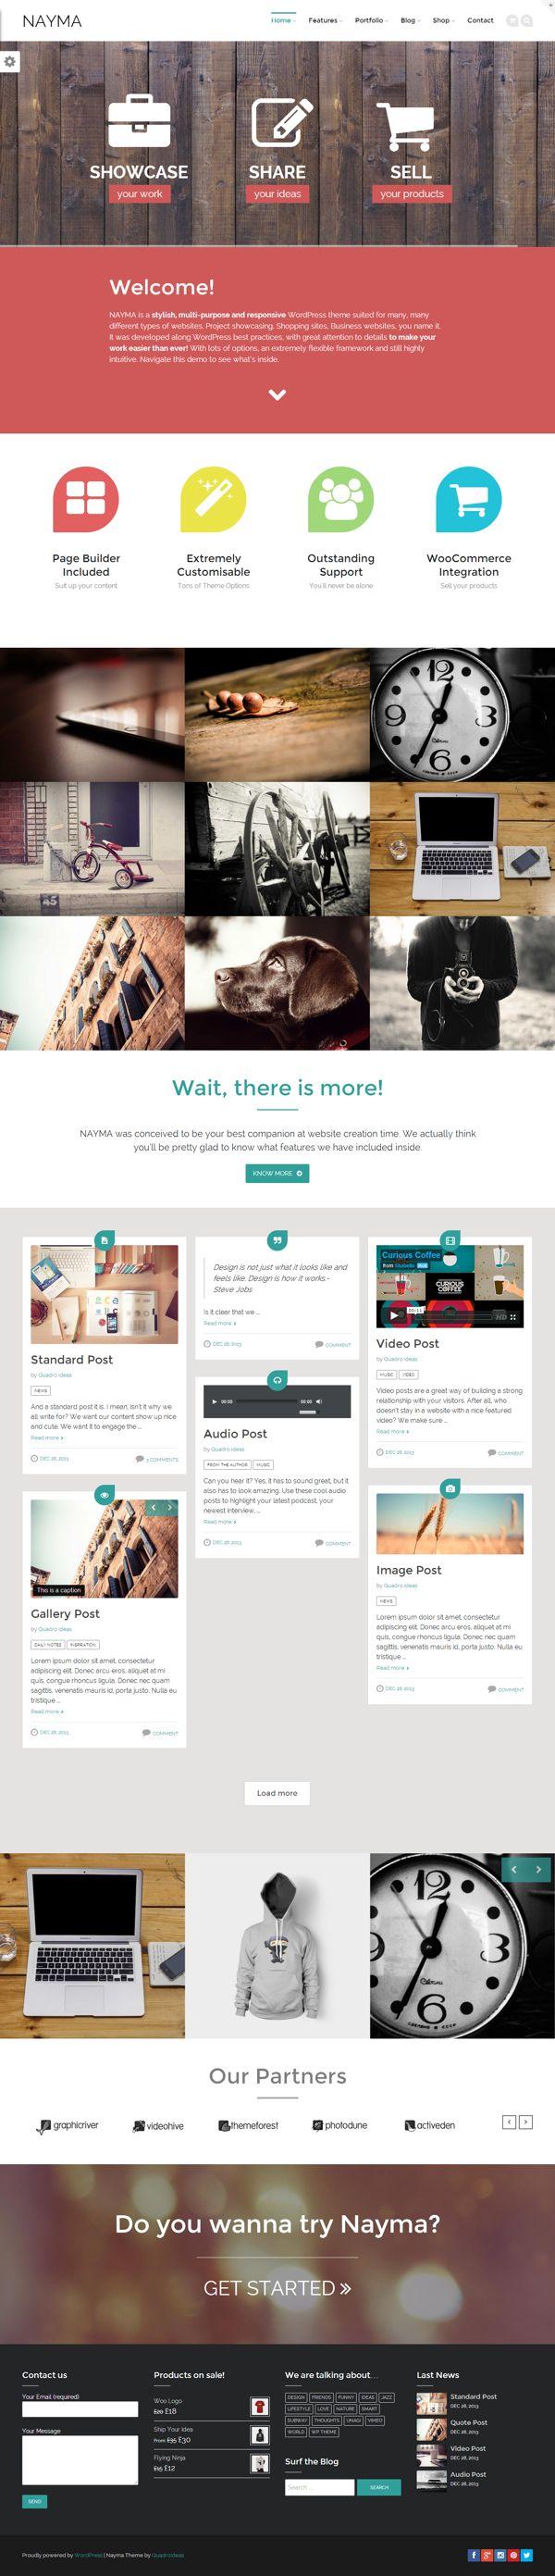 Nayma - Multi-Purpose WordPress by WordPress Design Awards, via Behance